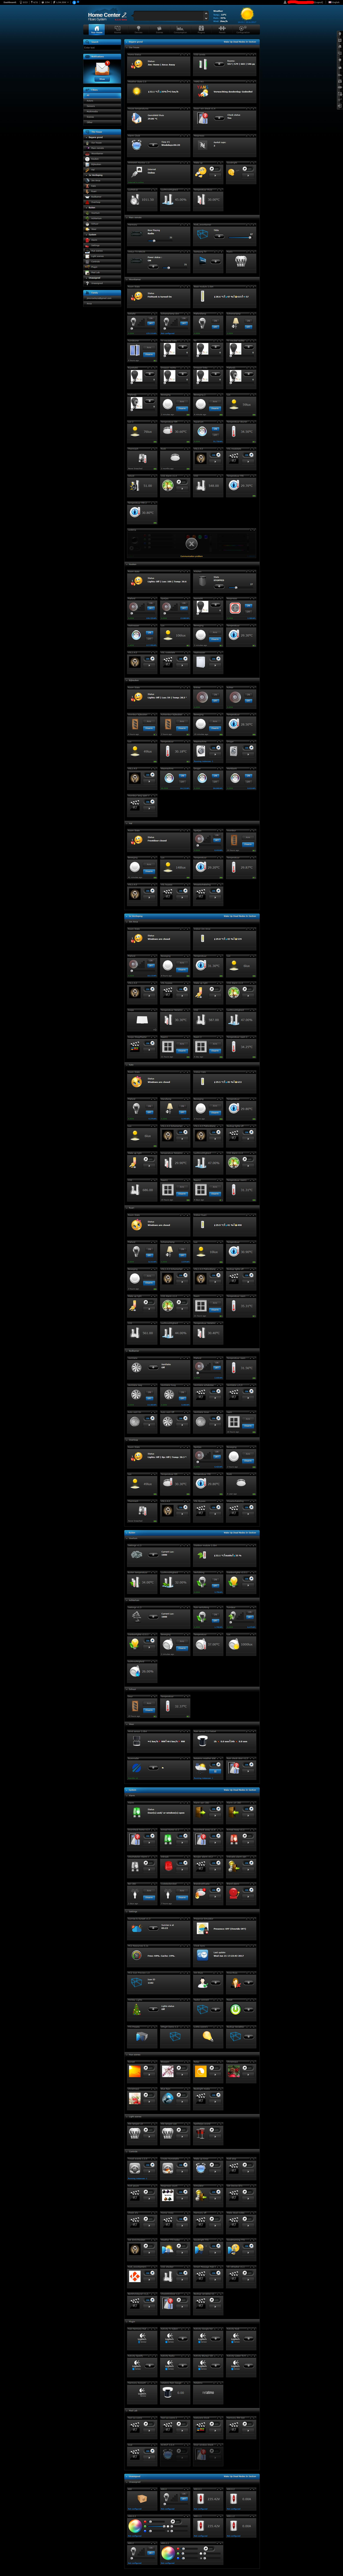 My Setup (HW, SW, Scenes, VD, Map, etc) - Page 2 - Scenes